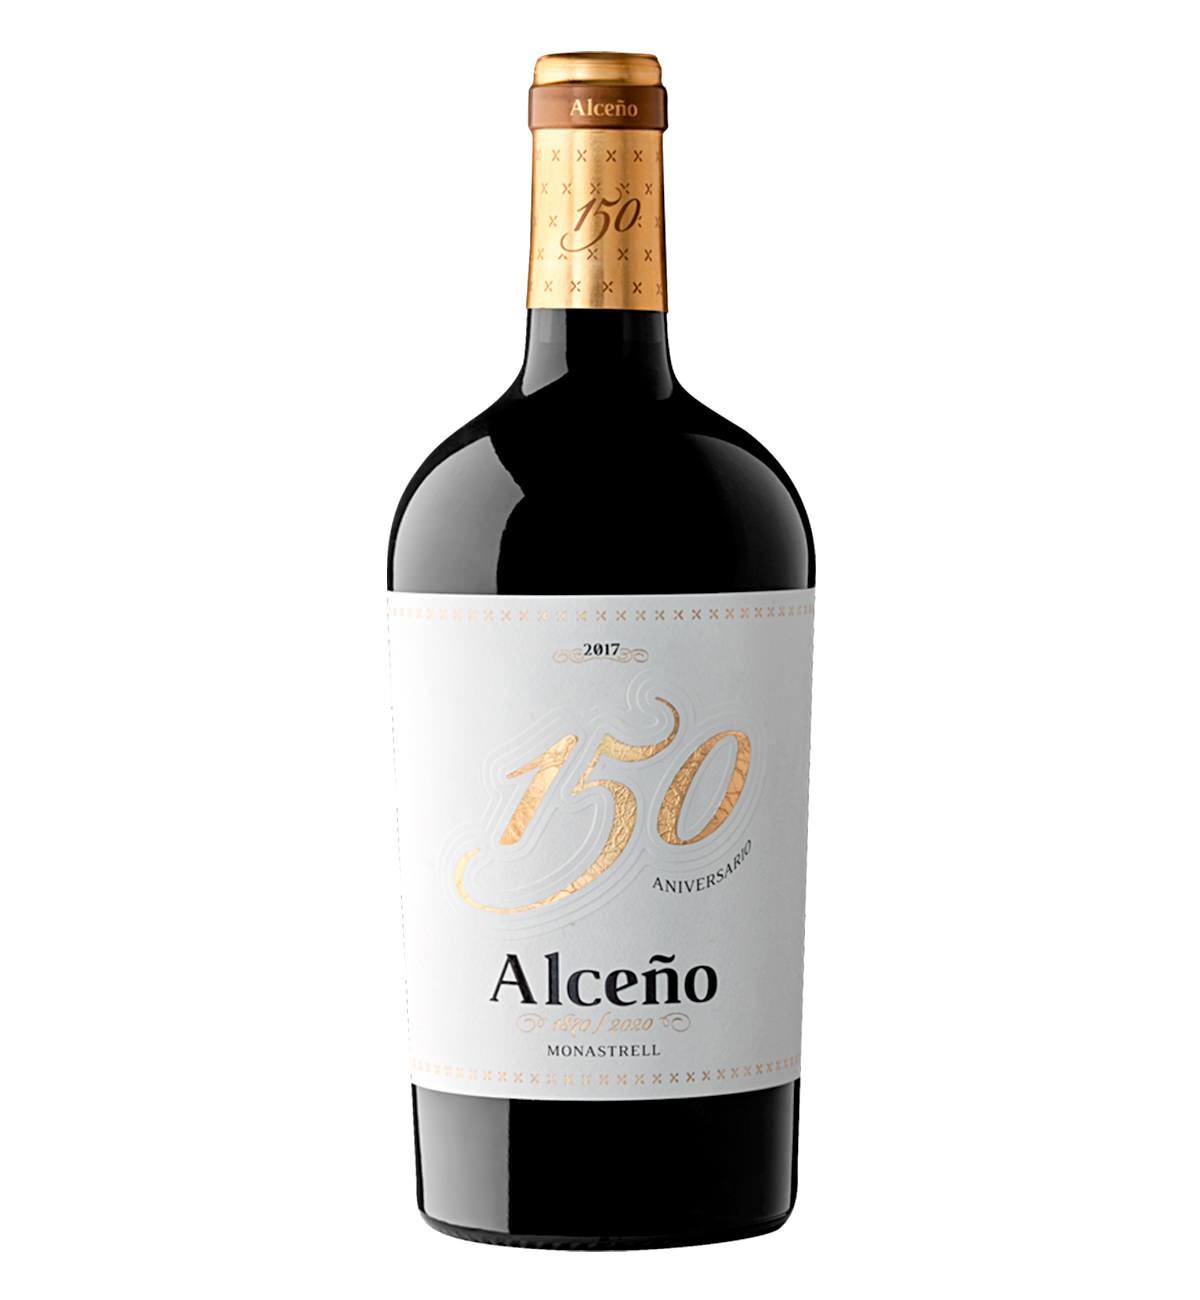 Alceño 150 Aniversario 2017 Monastrell, Vino tinto, Jumilla